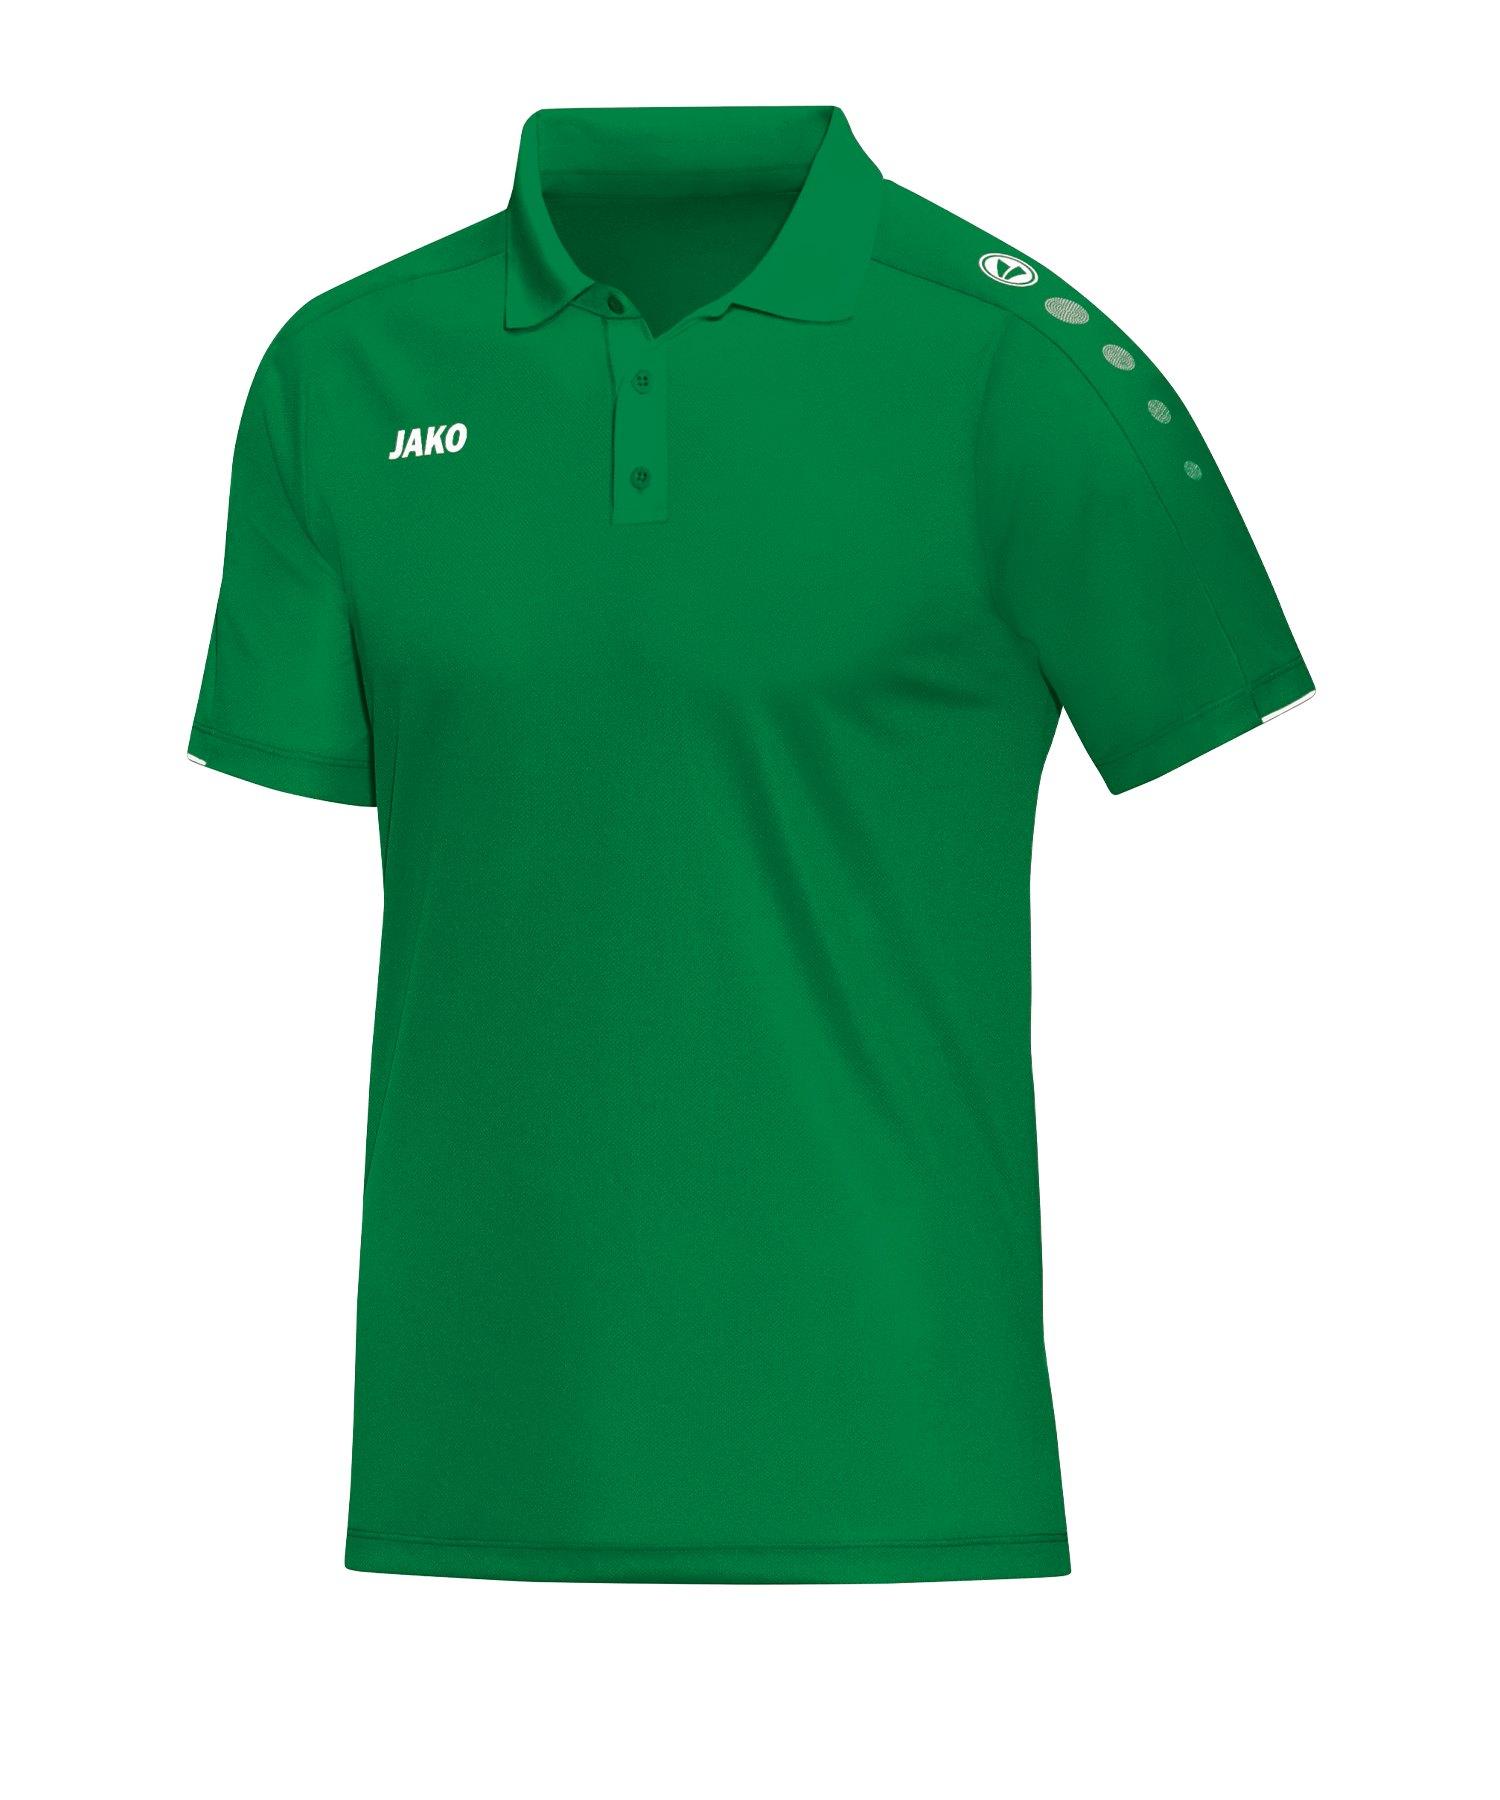 Jako Classico Poloshirt Damen Grün F06 - Gruen